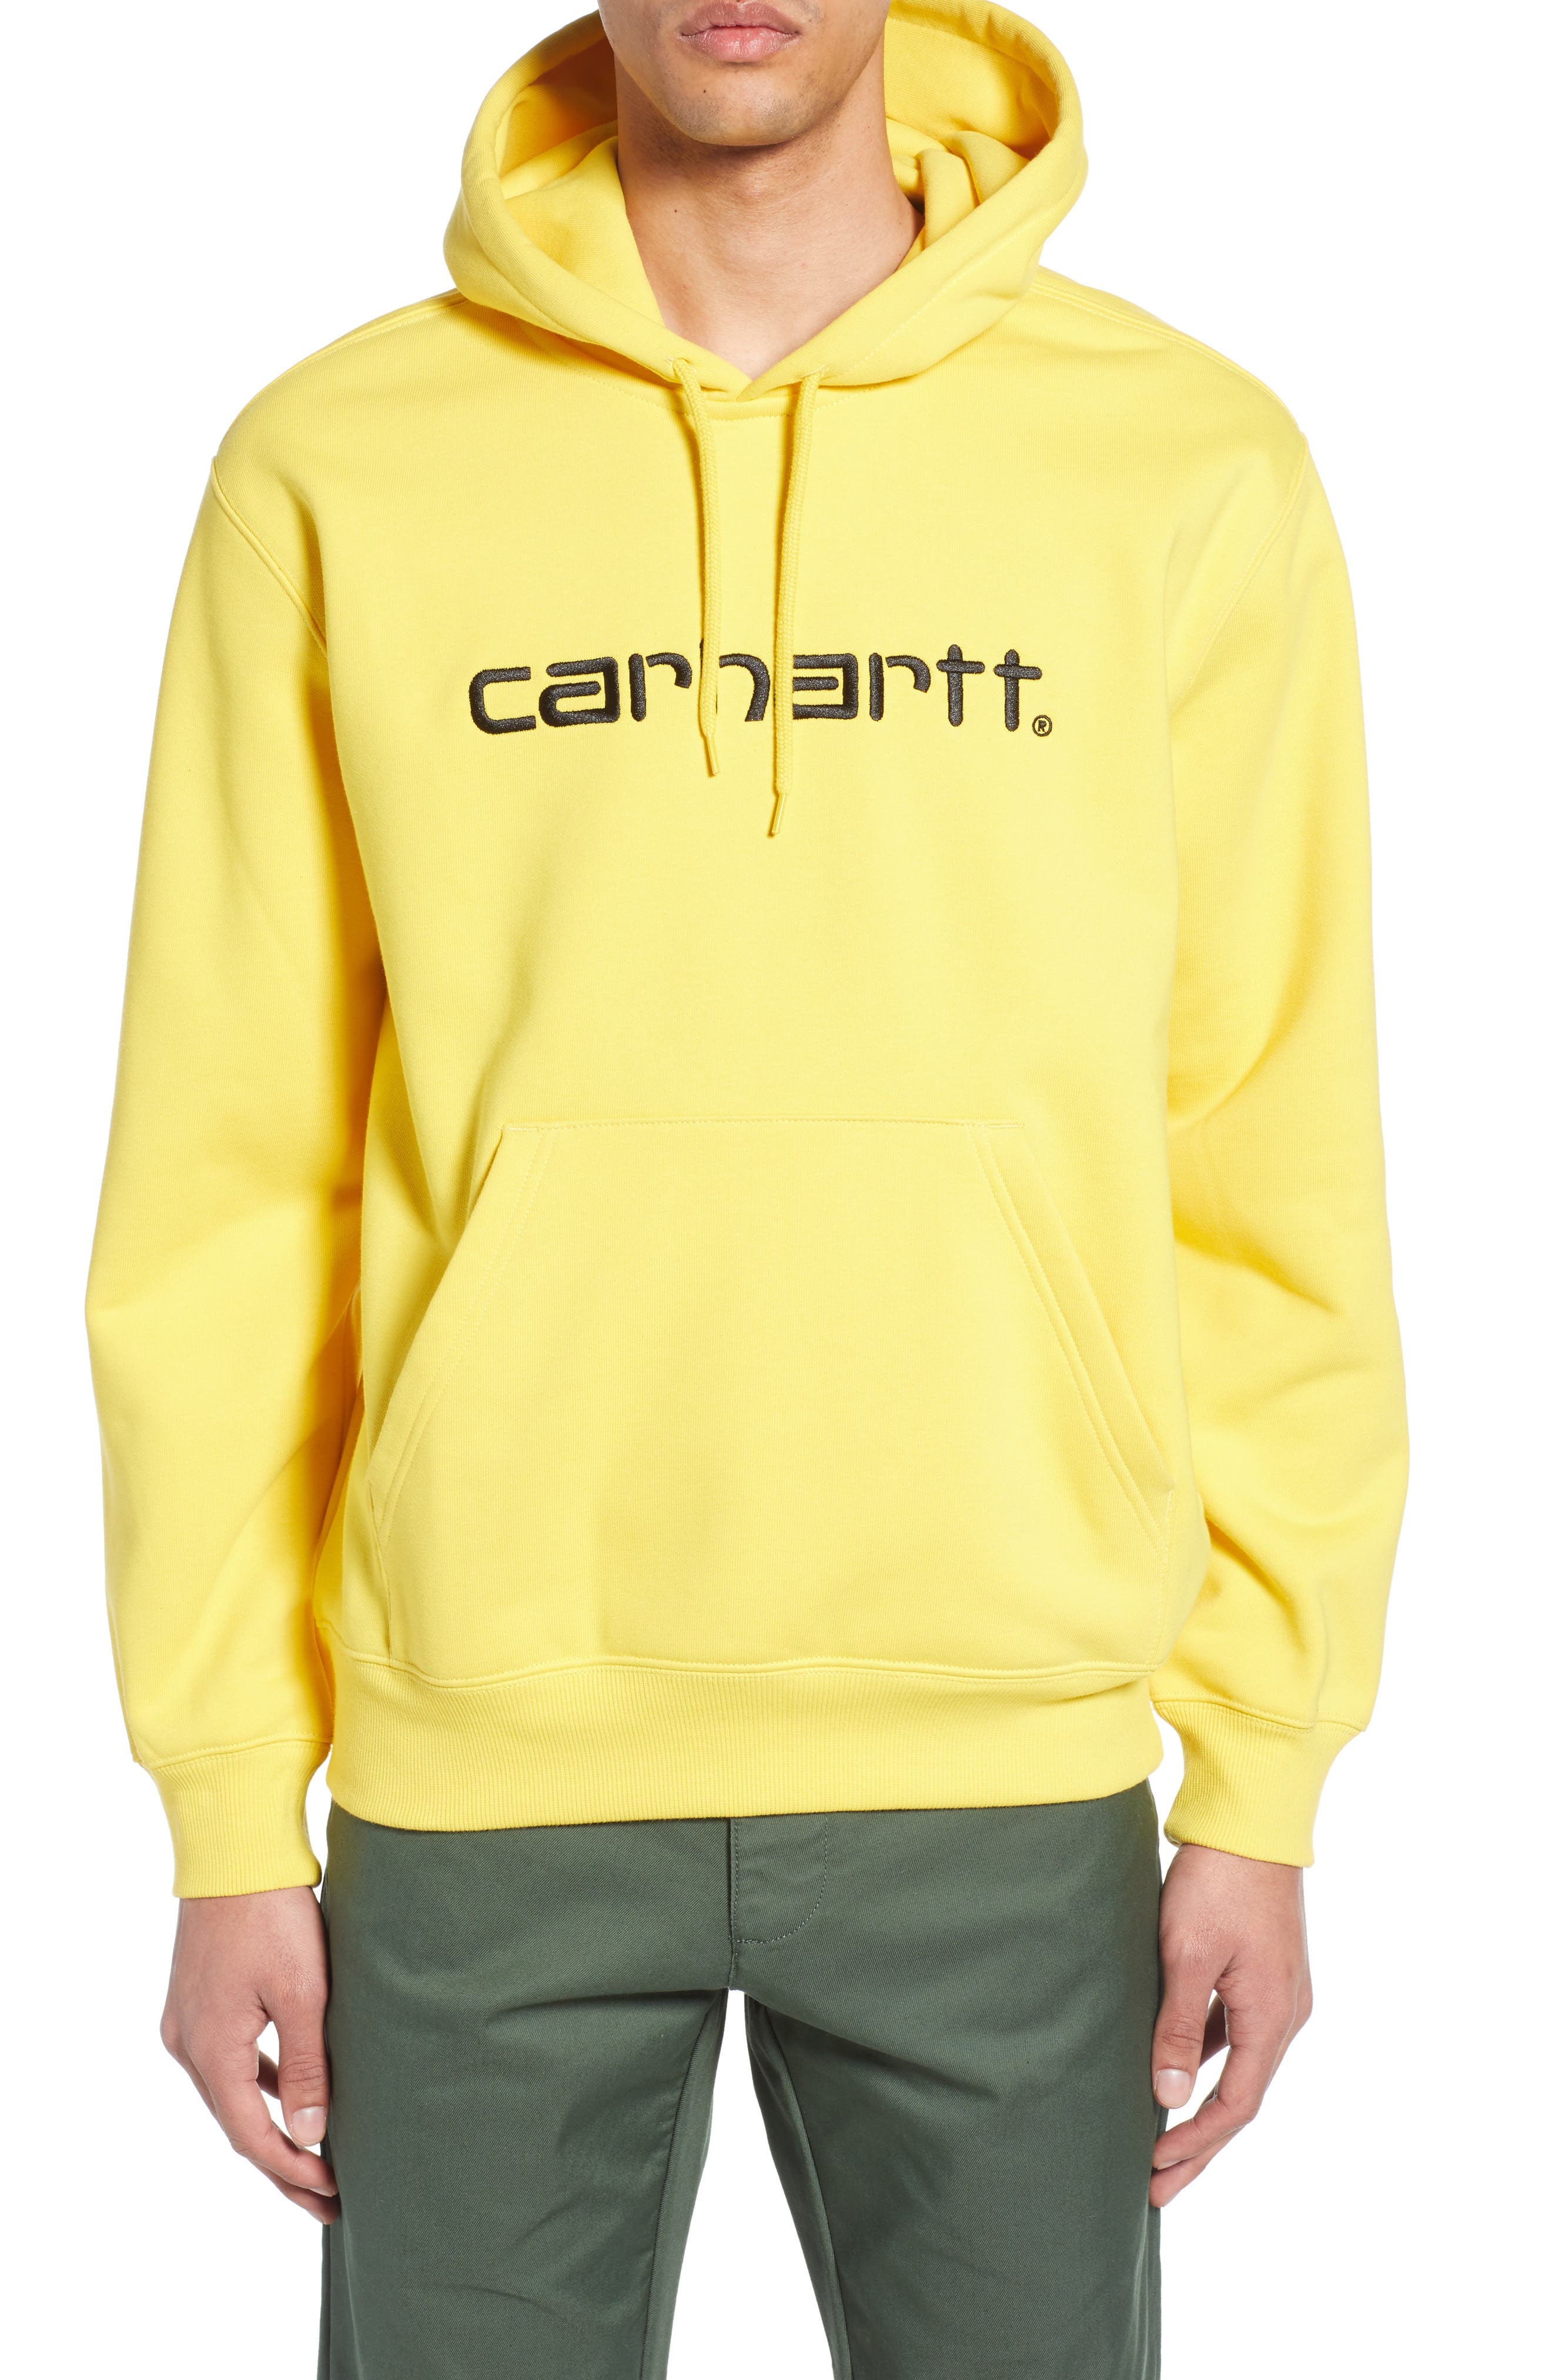 CARHARTT WORK IN PROGRESS, Hooded Sweatshirt, Main thumbnail 1, color, PRIMULA / BLACK